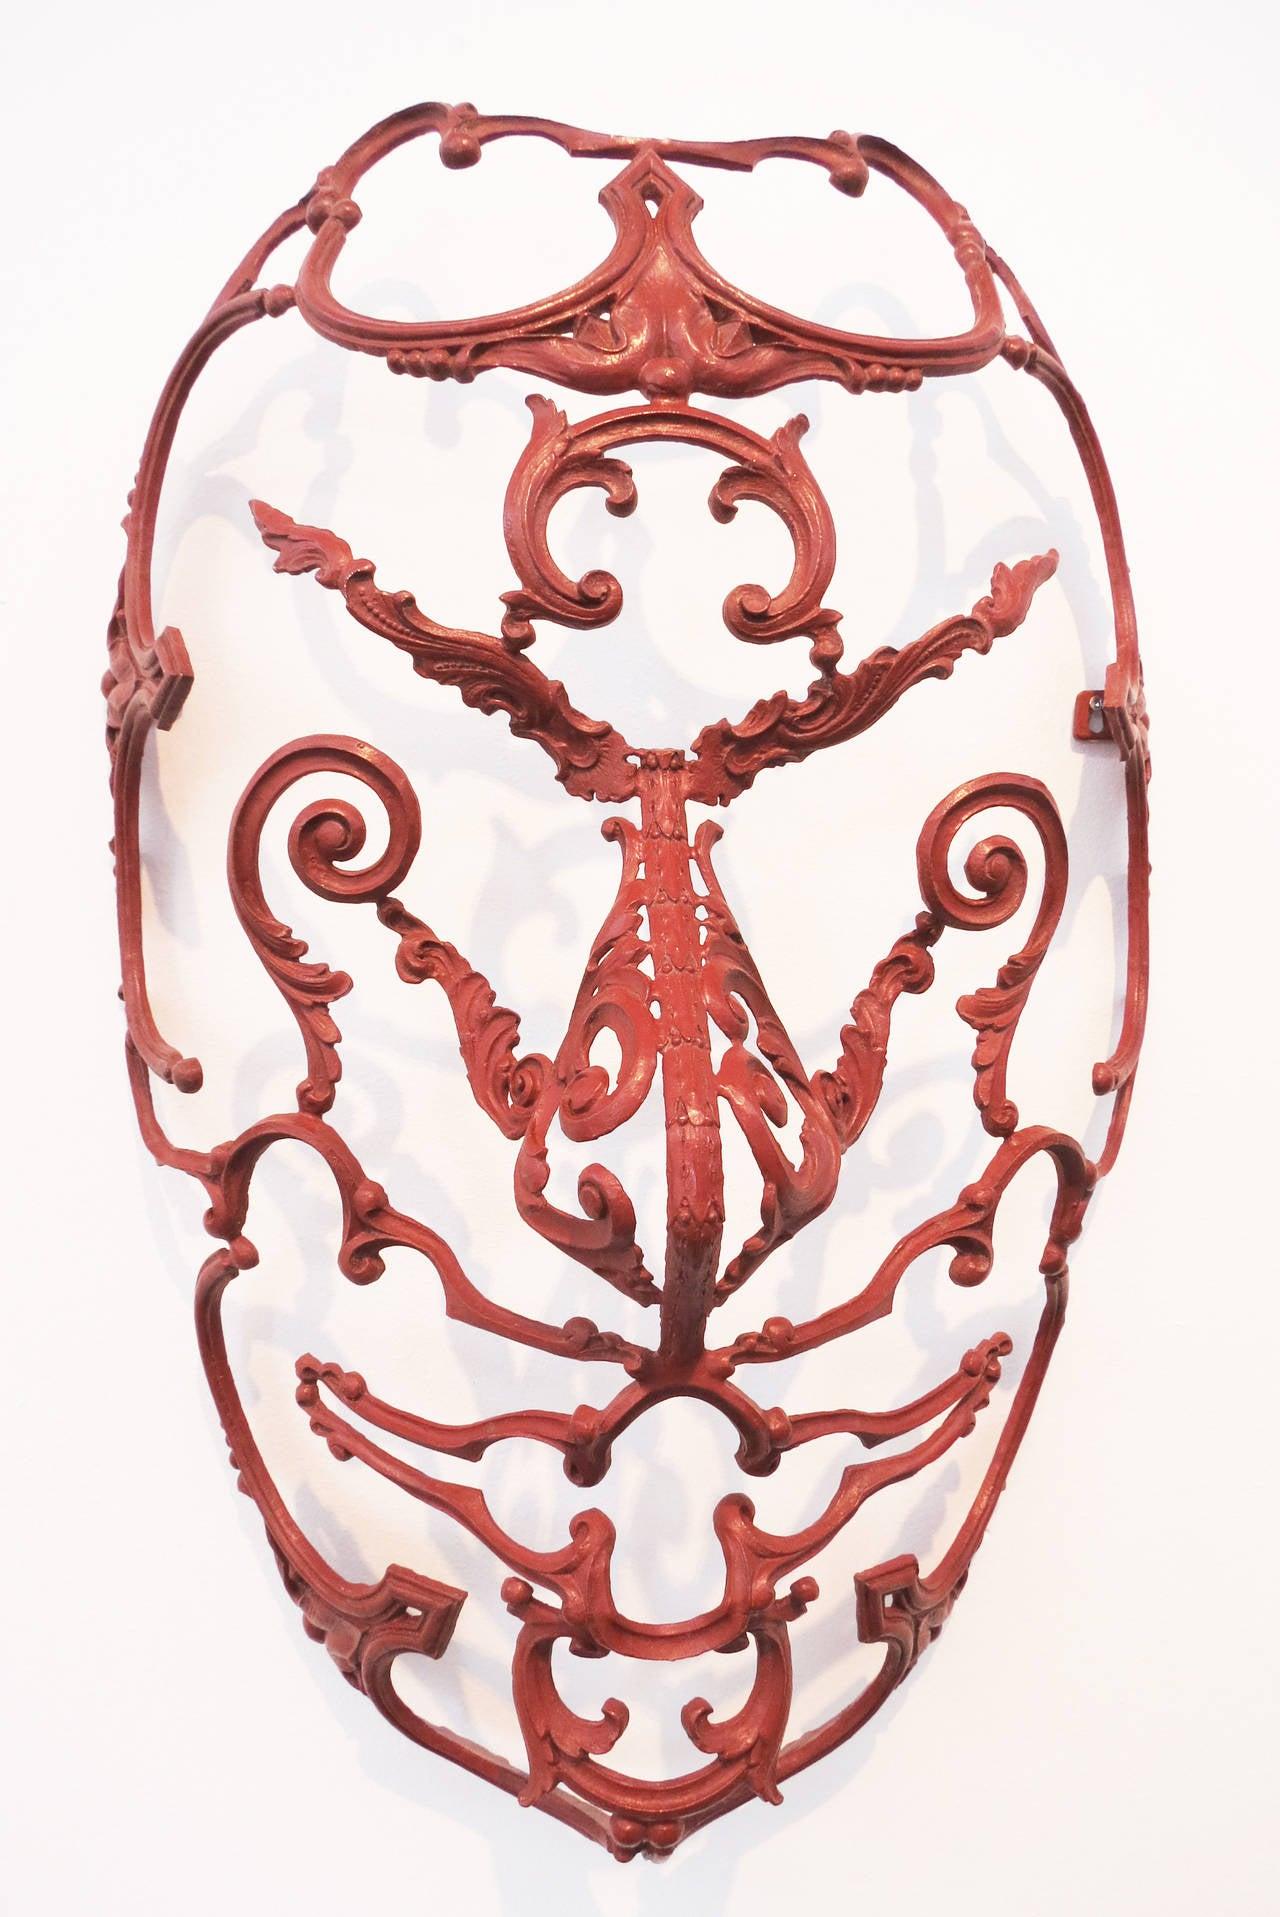 Dale Dunning Figurative Sculpture - Akai Koi